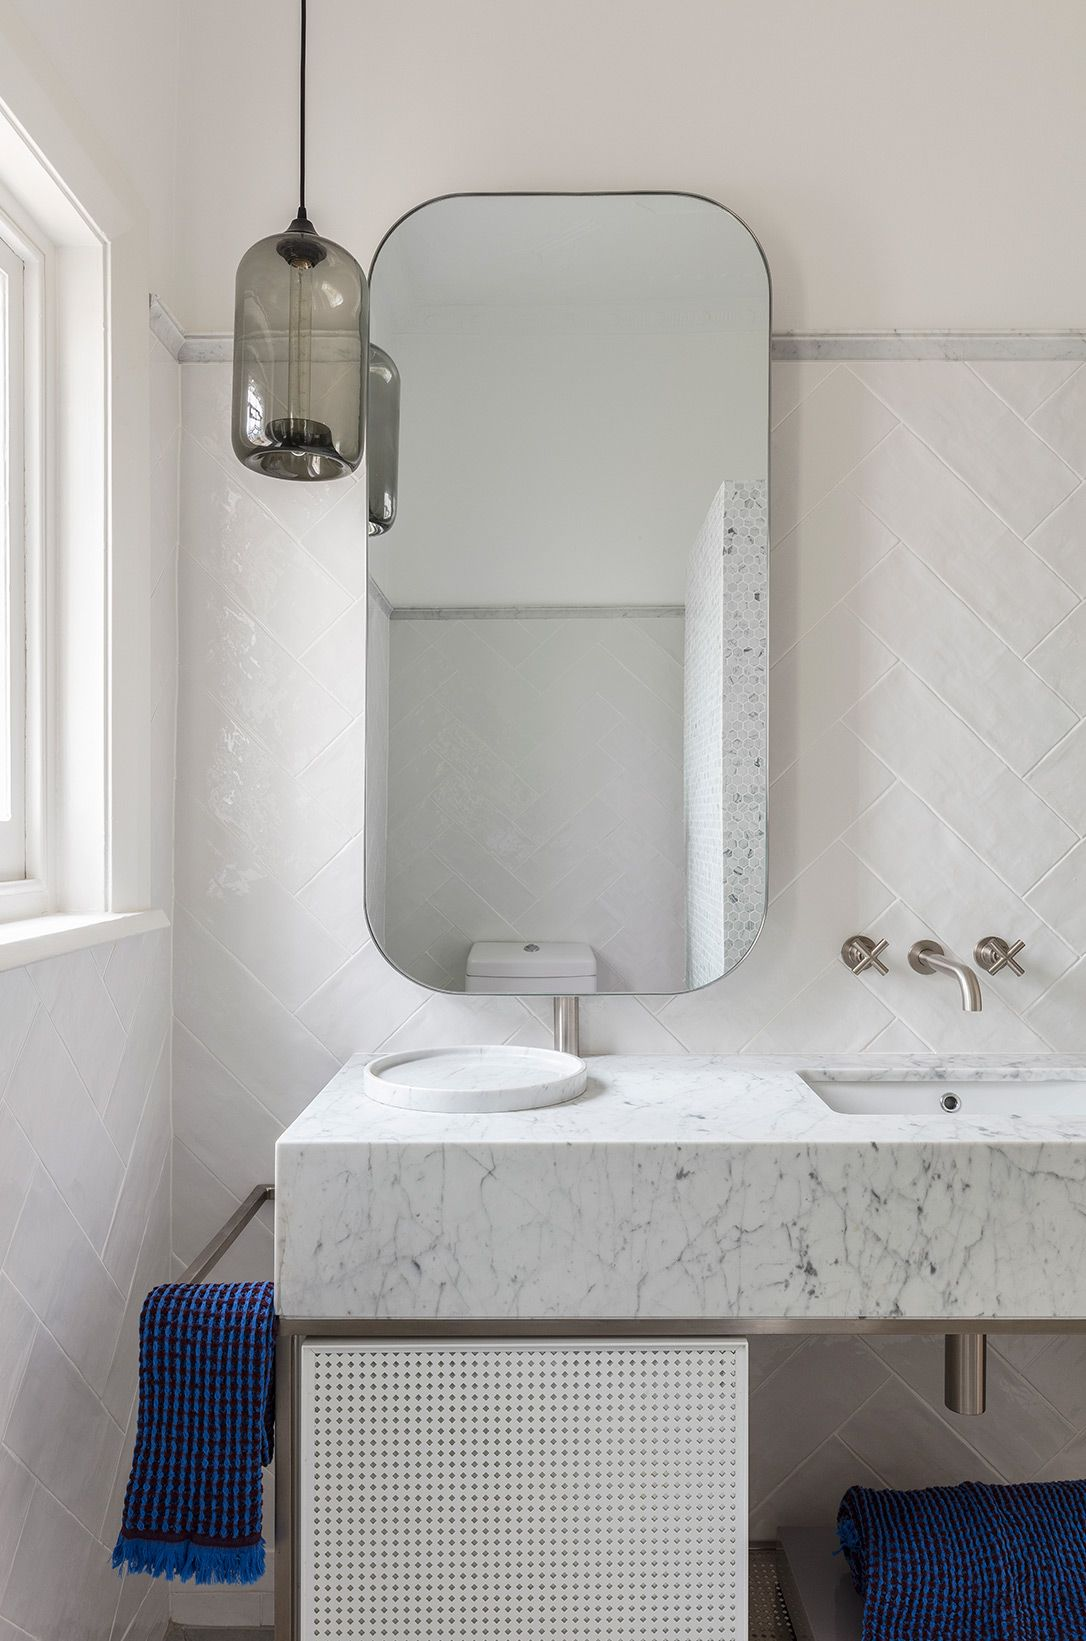 Hooper House Arent Pyke Modern Bathroom Vanity Lighting